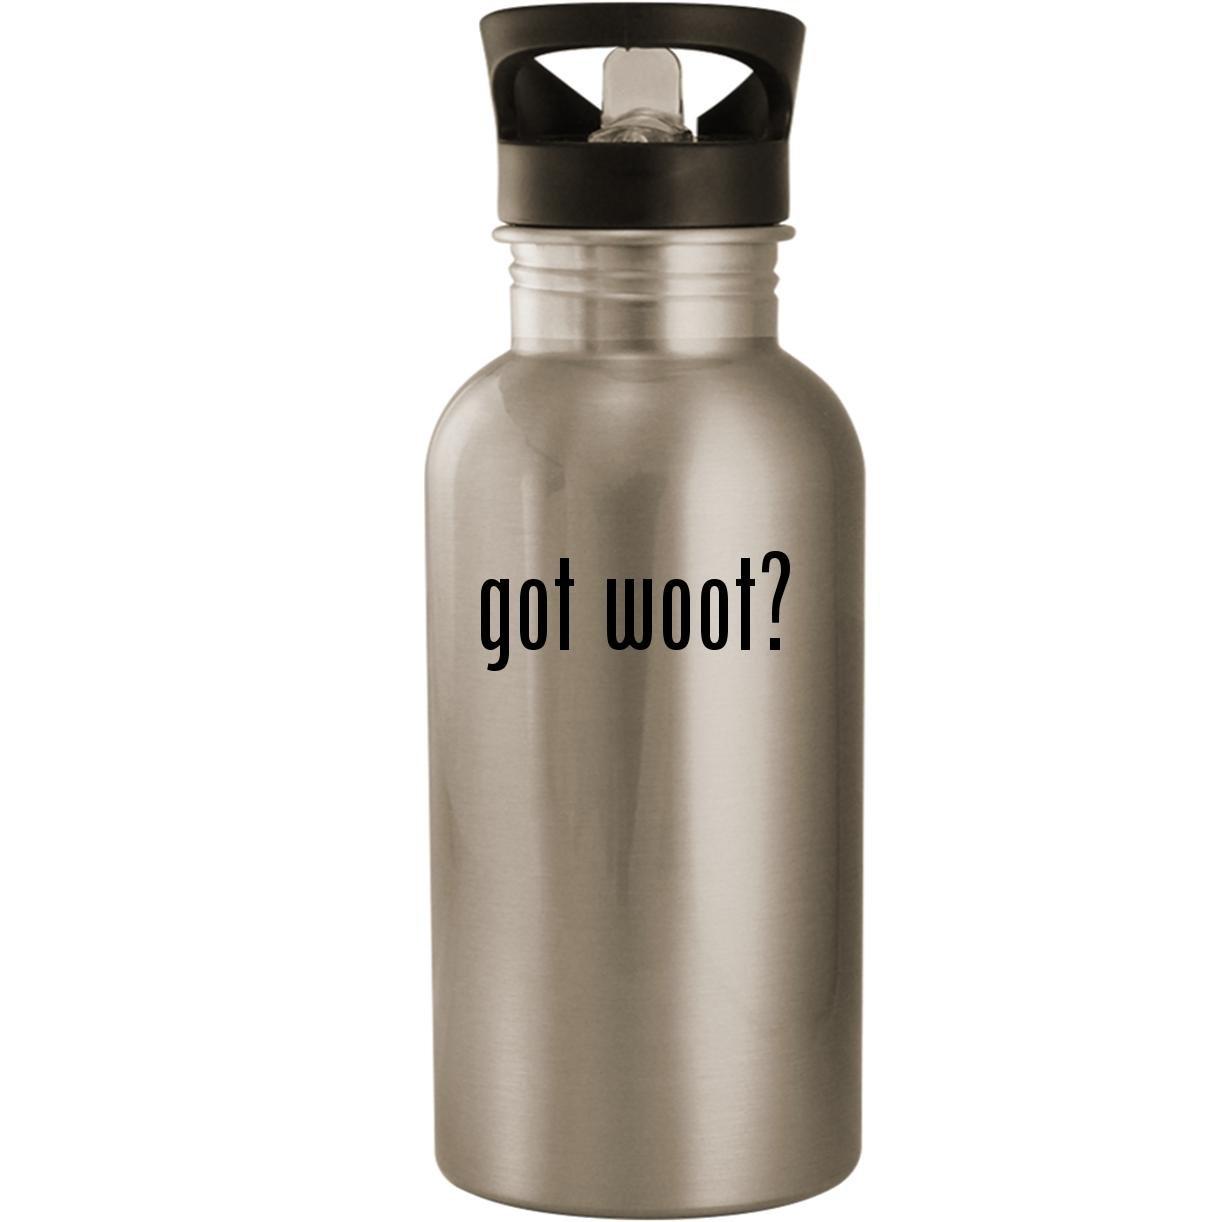 Got Woot  – ステンレススチール20oz Road Ready水ボトル シルバー US-C-07-18-01-094574-04-26-18-26 B07FMP5WNN シルバー